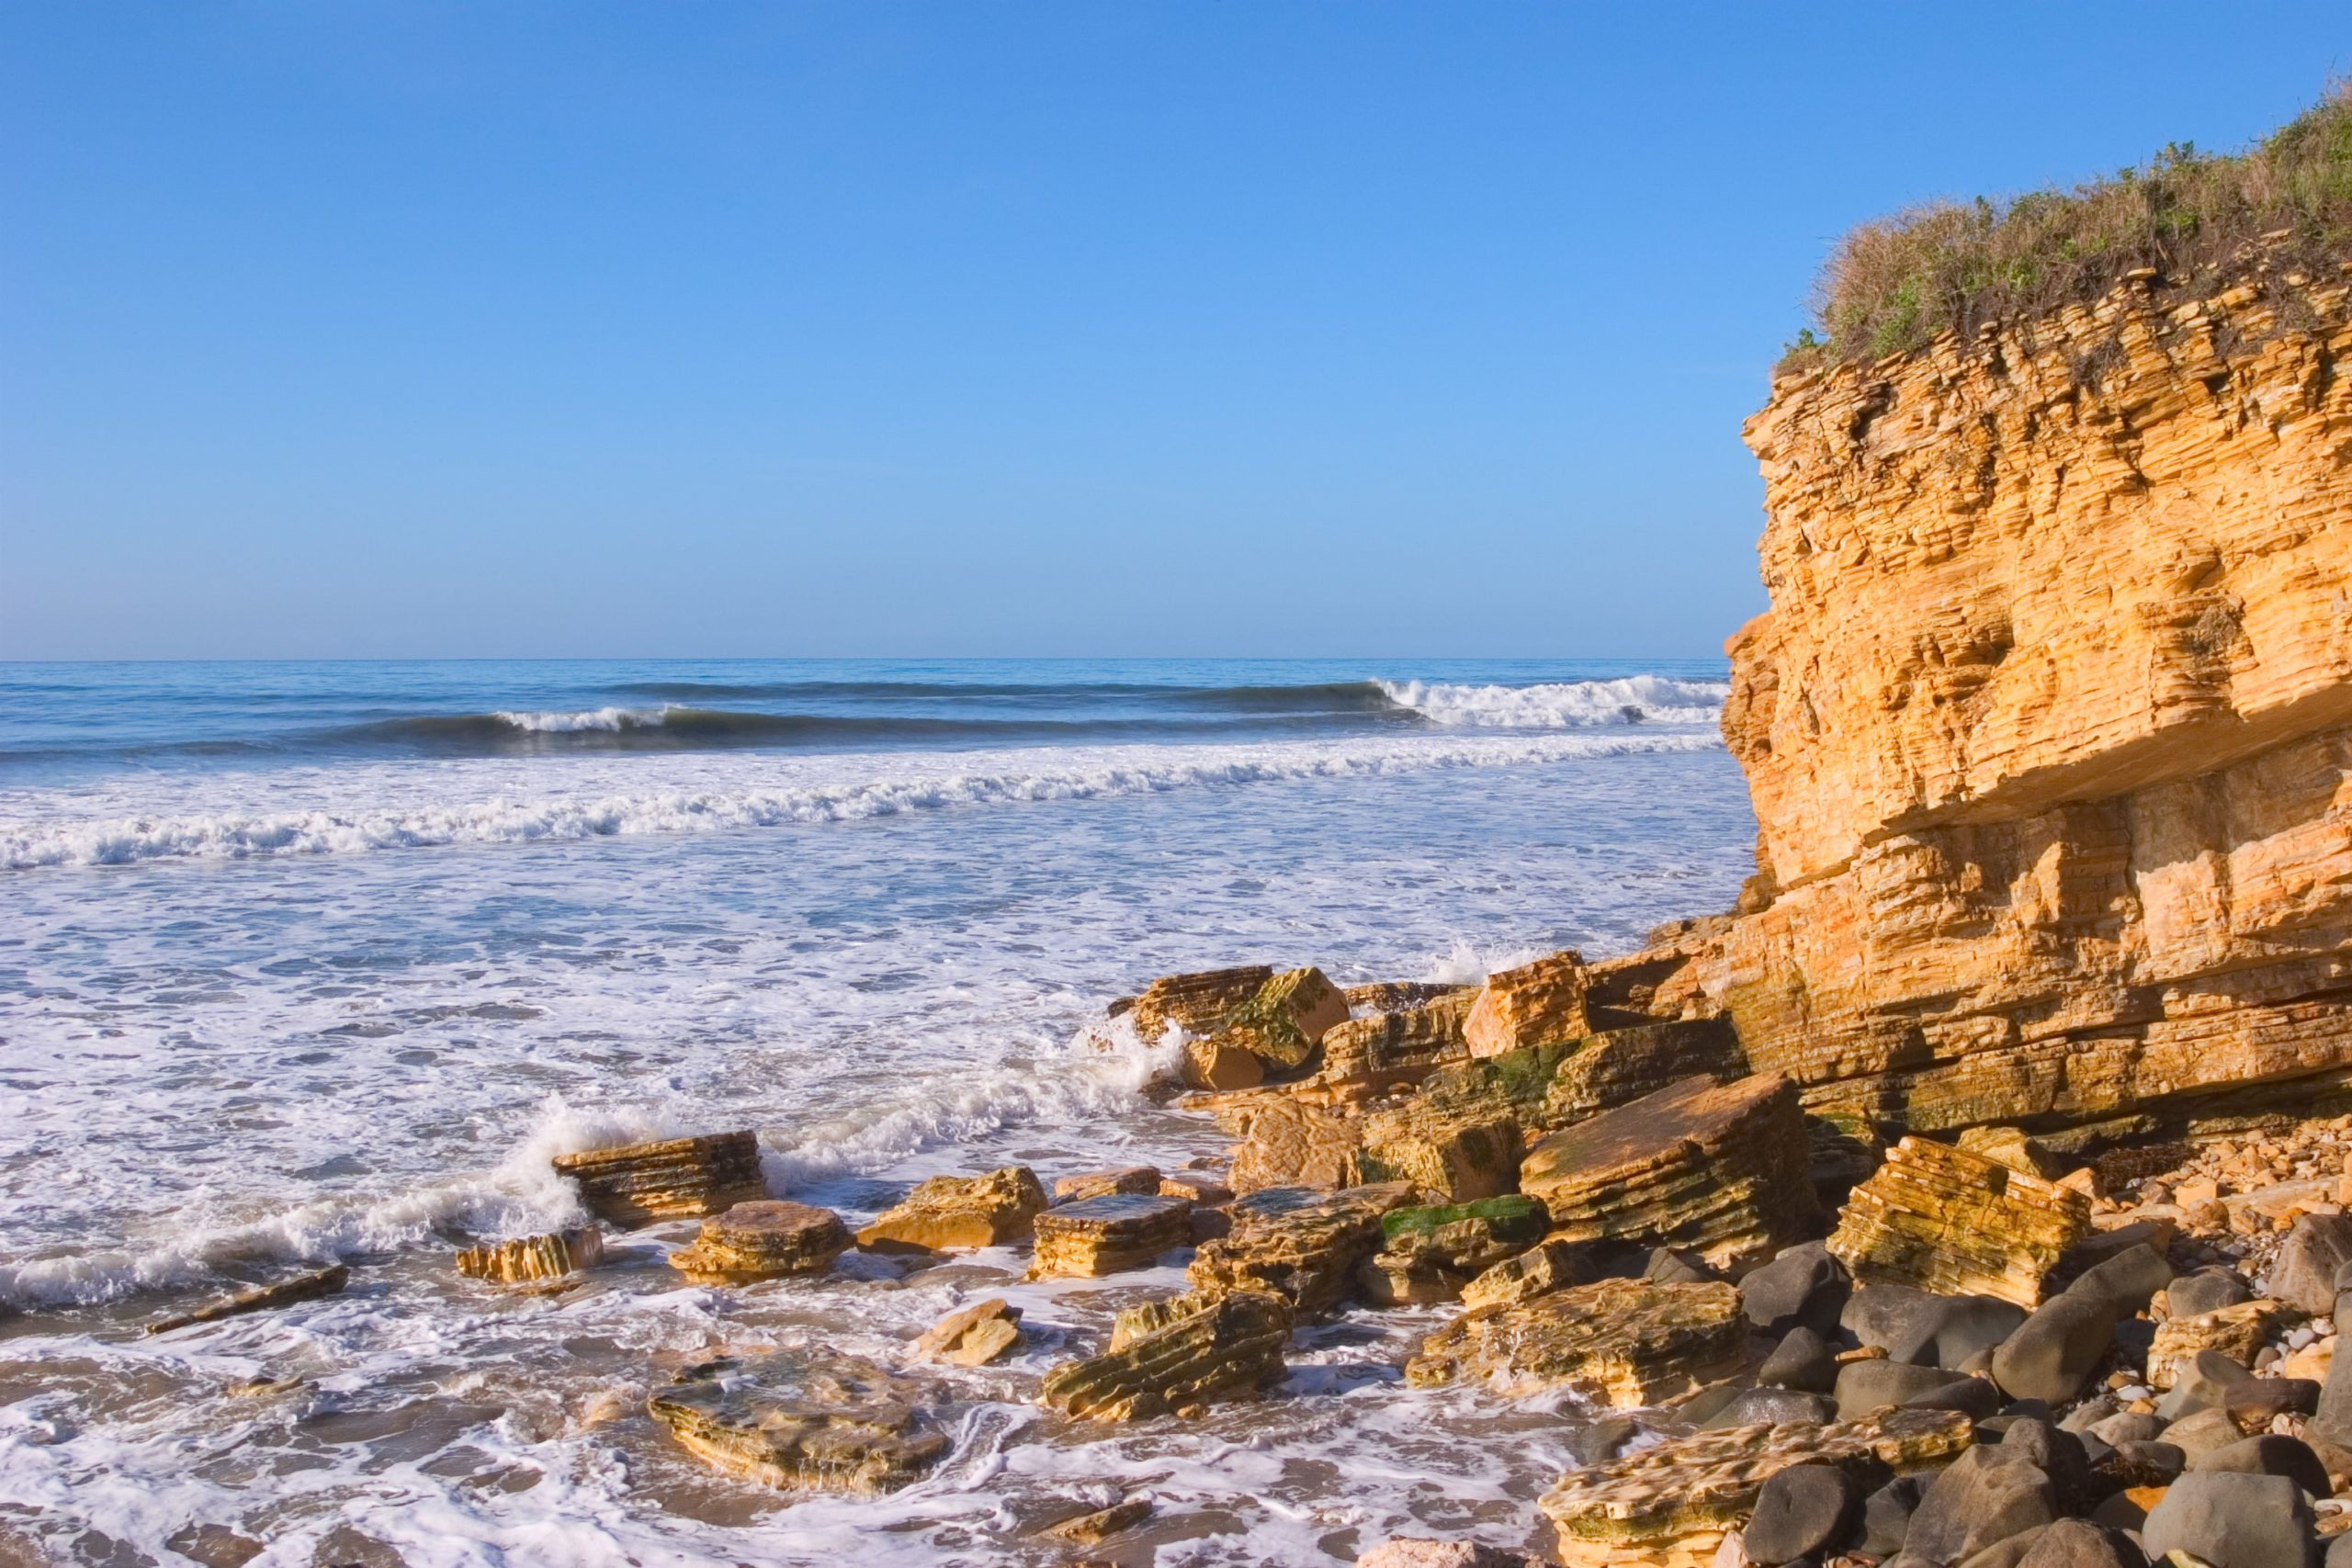 Surfing Santa Barbara - Refugio State Beach